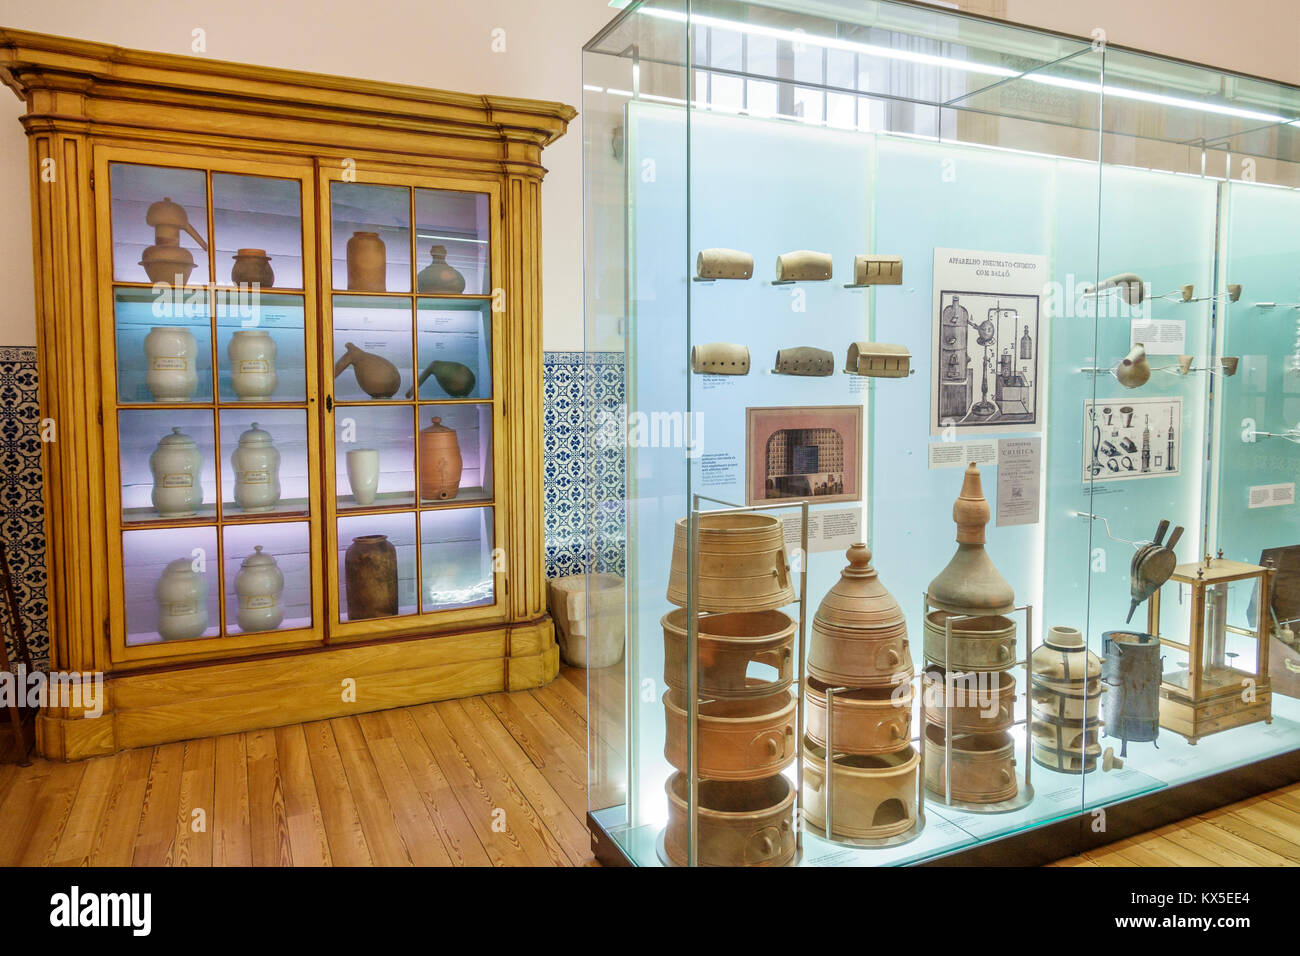 Universität Coimbra Coimbra Portugal Universidade de Coimbra Museu da Ciencia Science Museum Chemielabor wissenschaftliche Stockbild